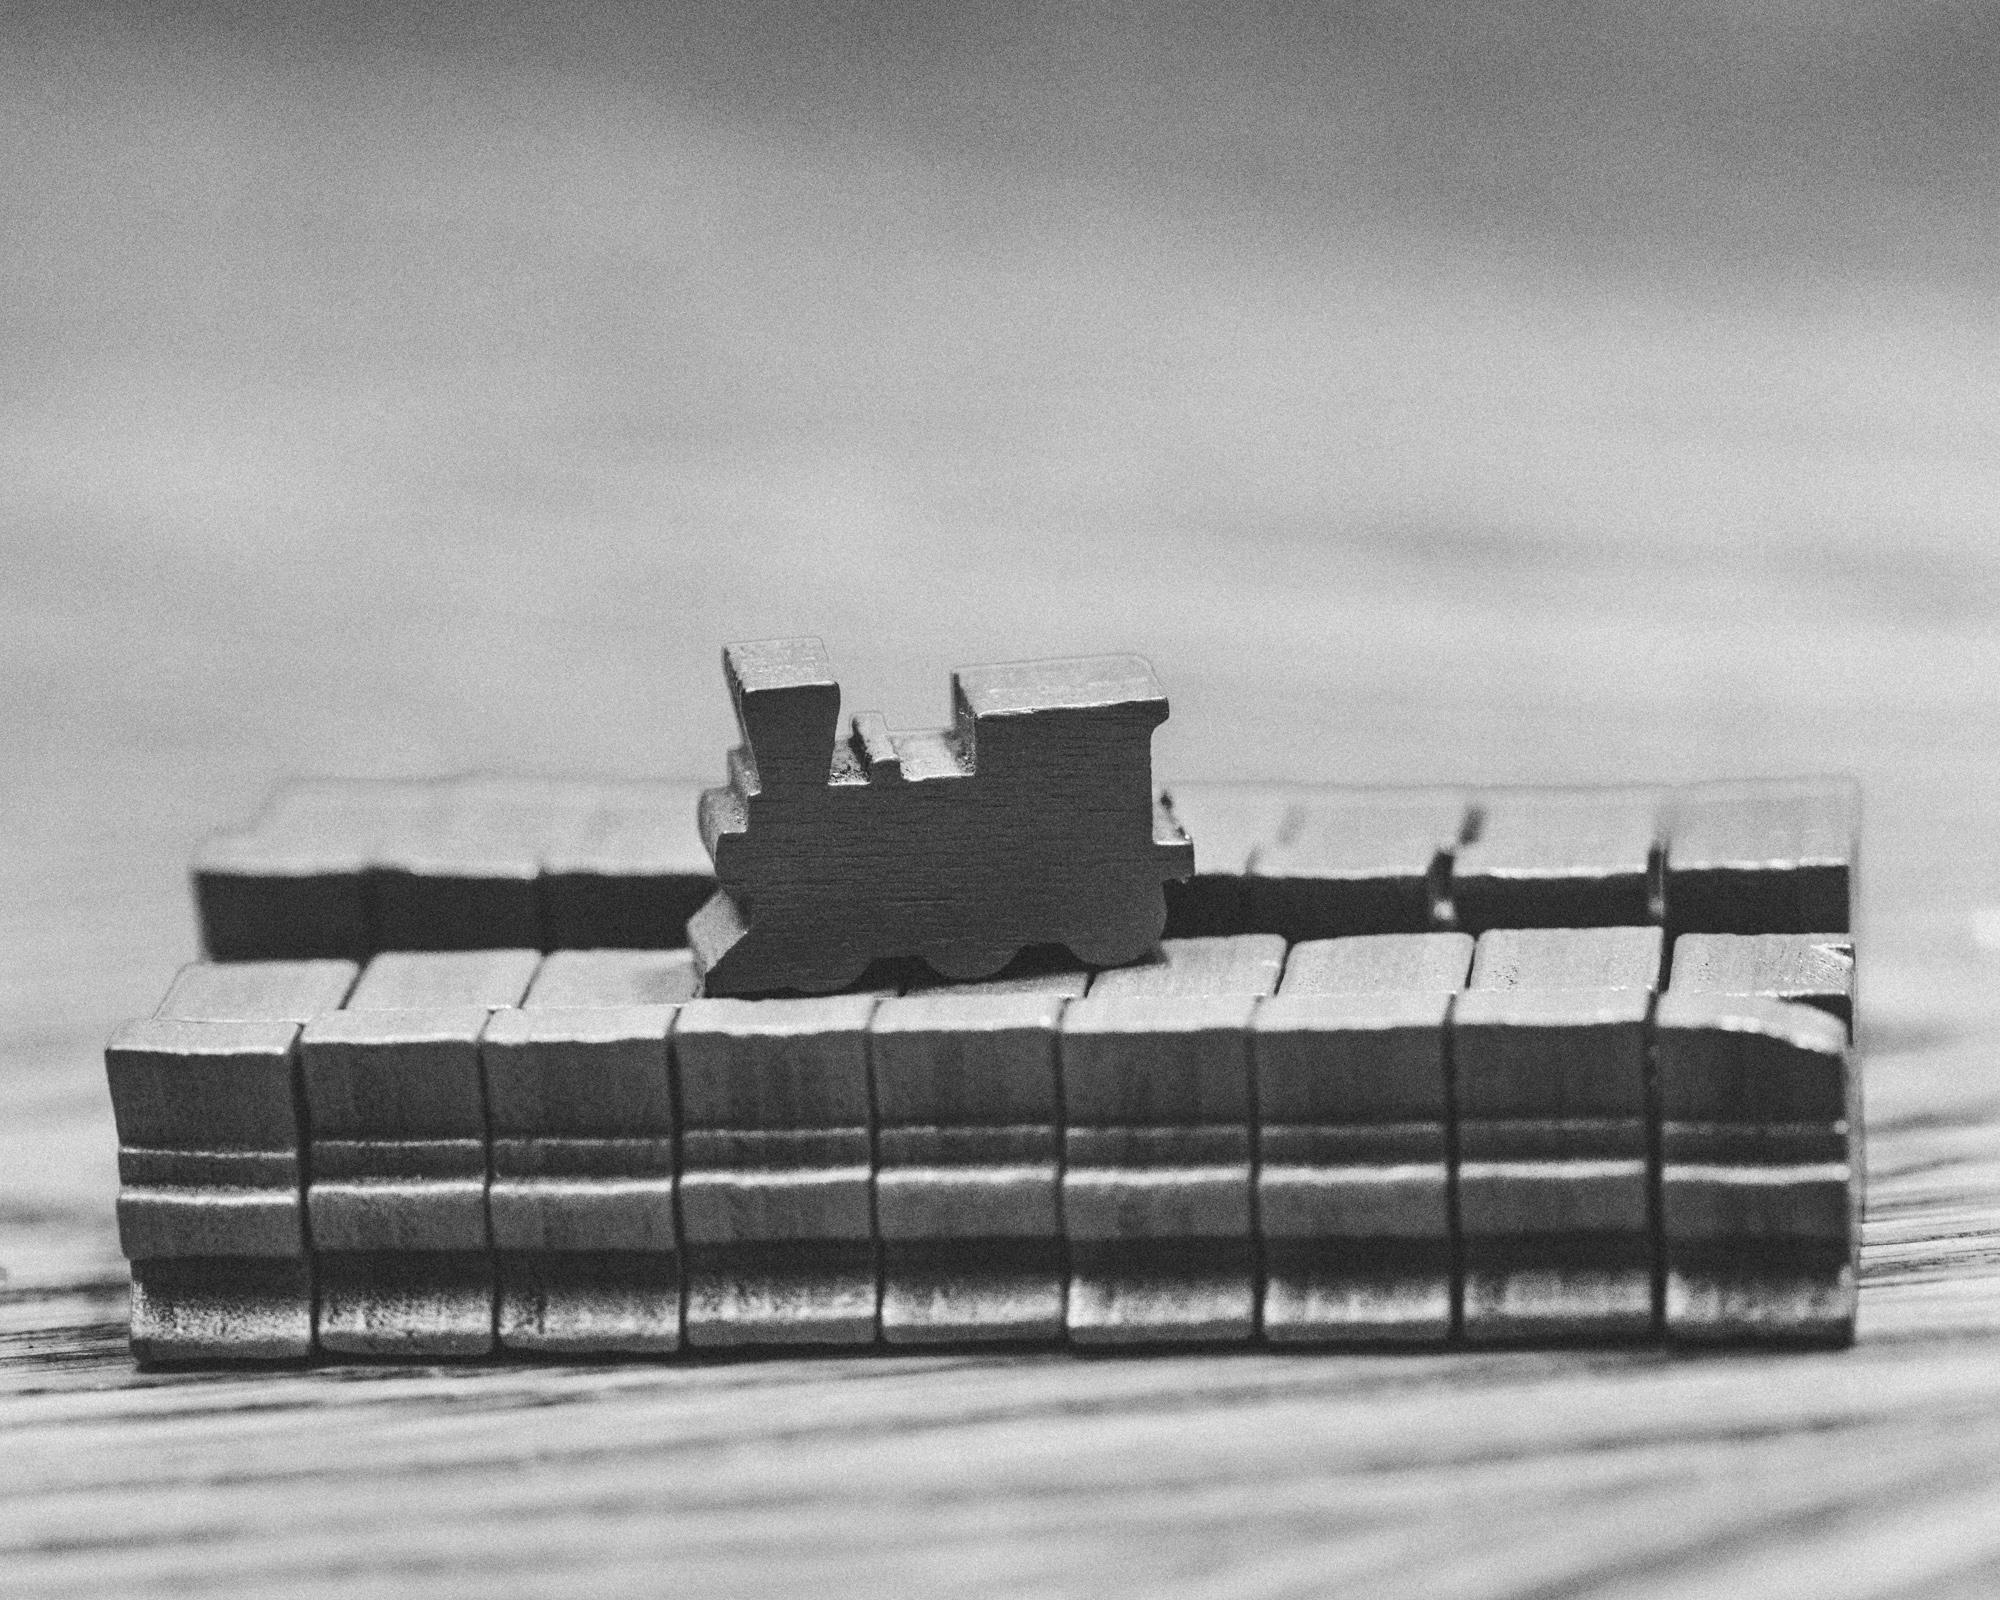 railroadrivals-101.jpg